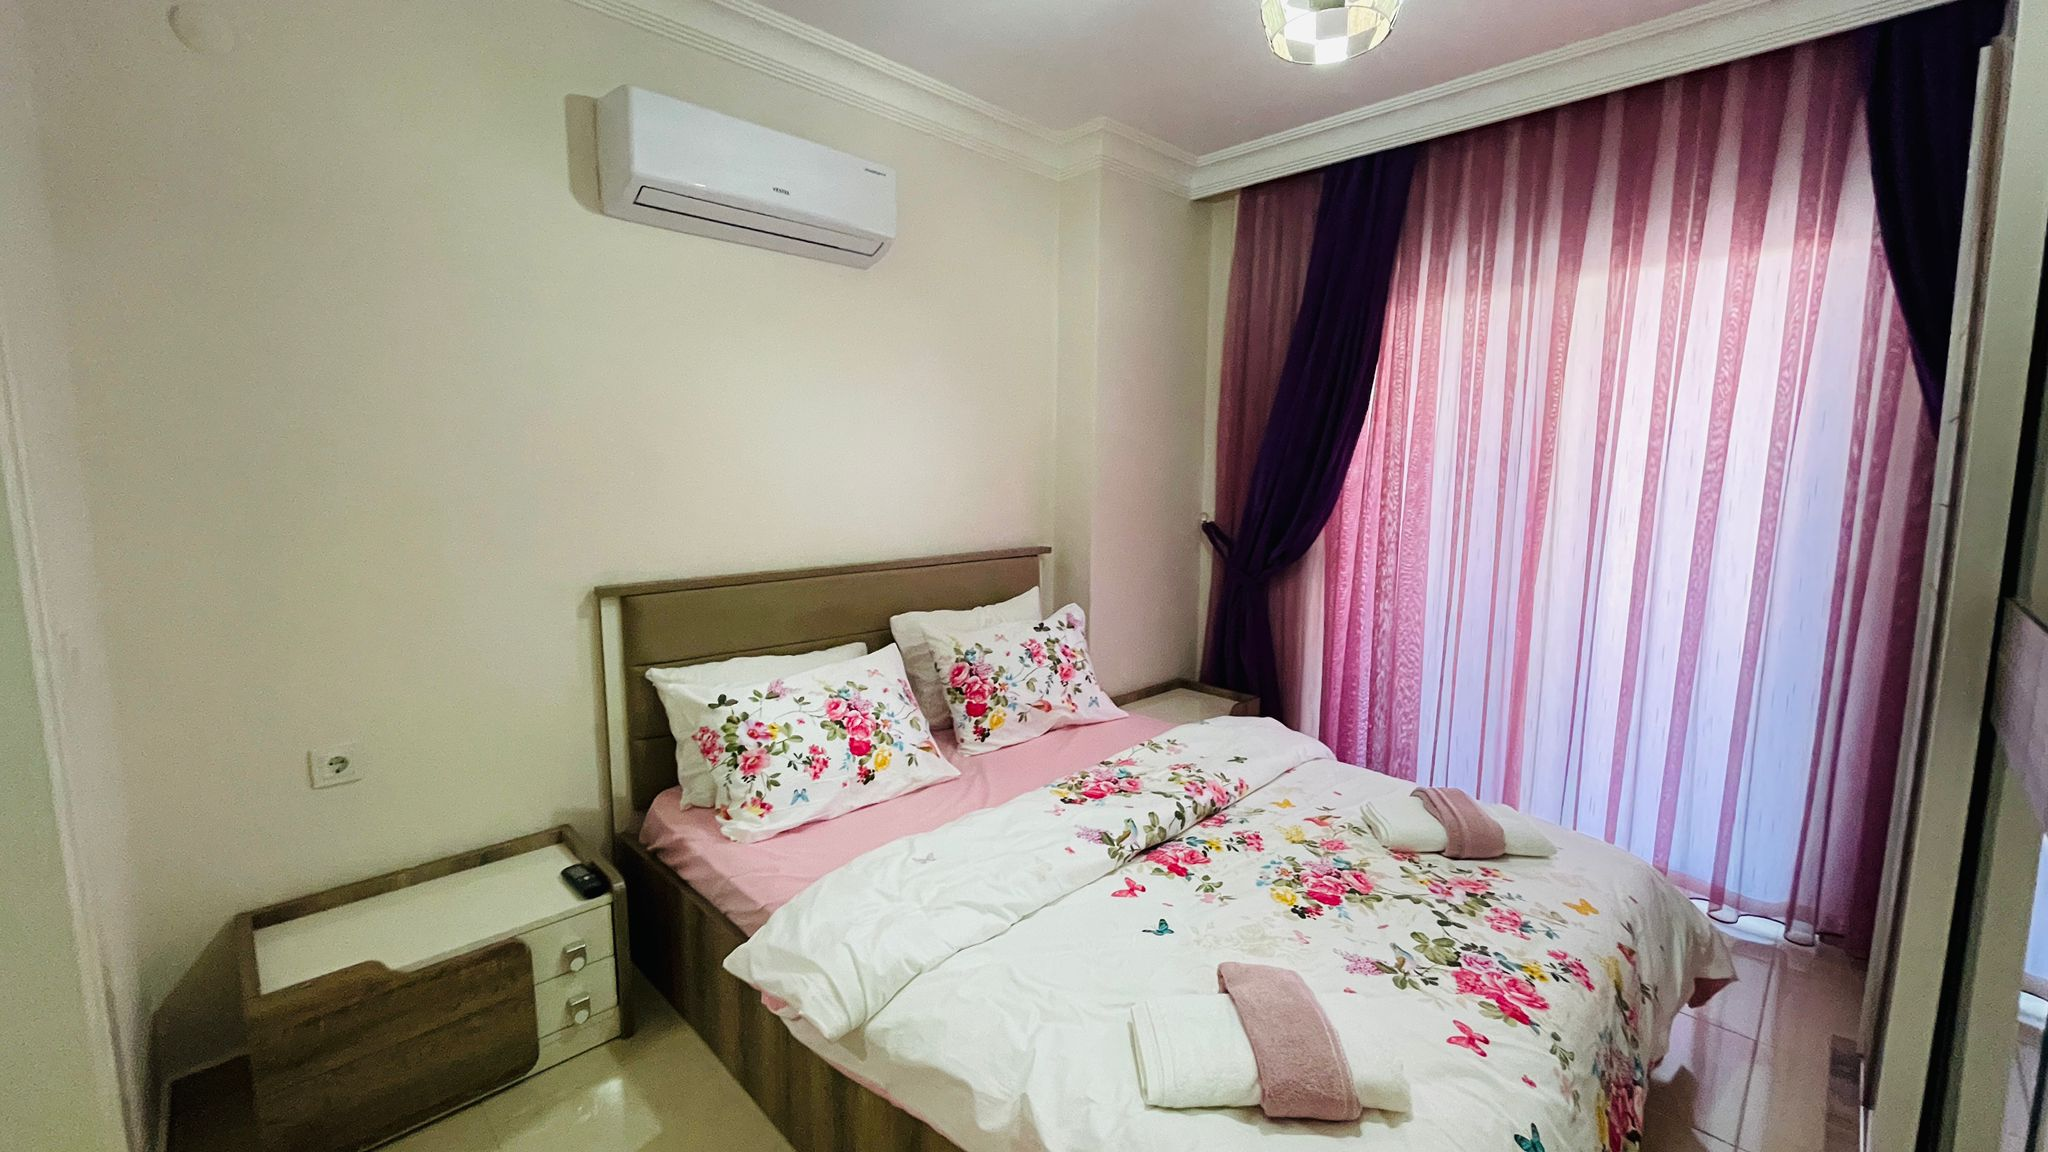 Меблированная квартира 2+1 в районе Махмутлар - Фото 15